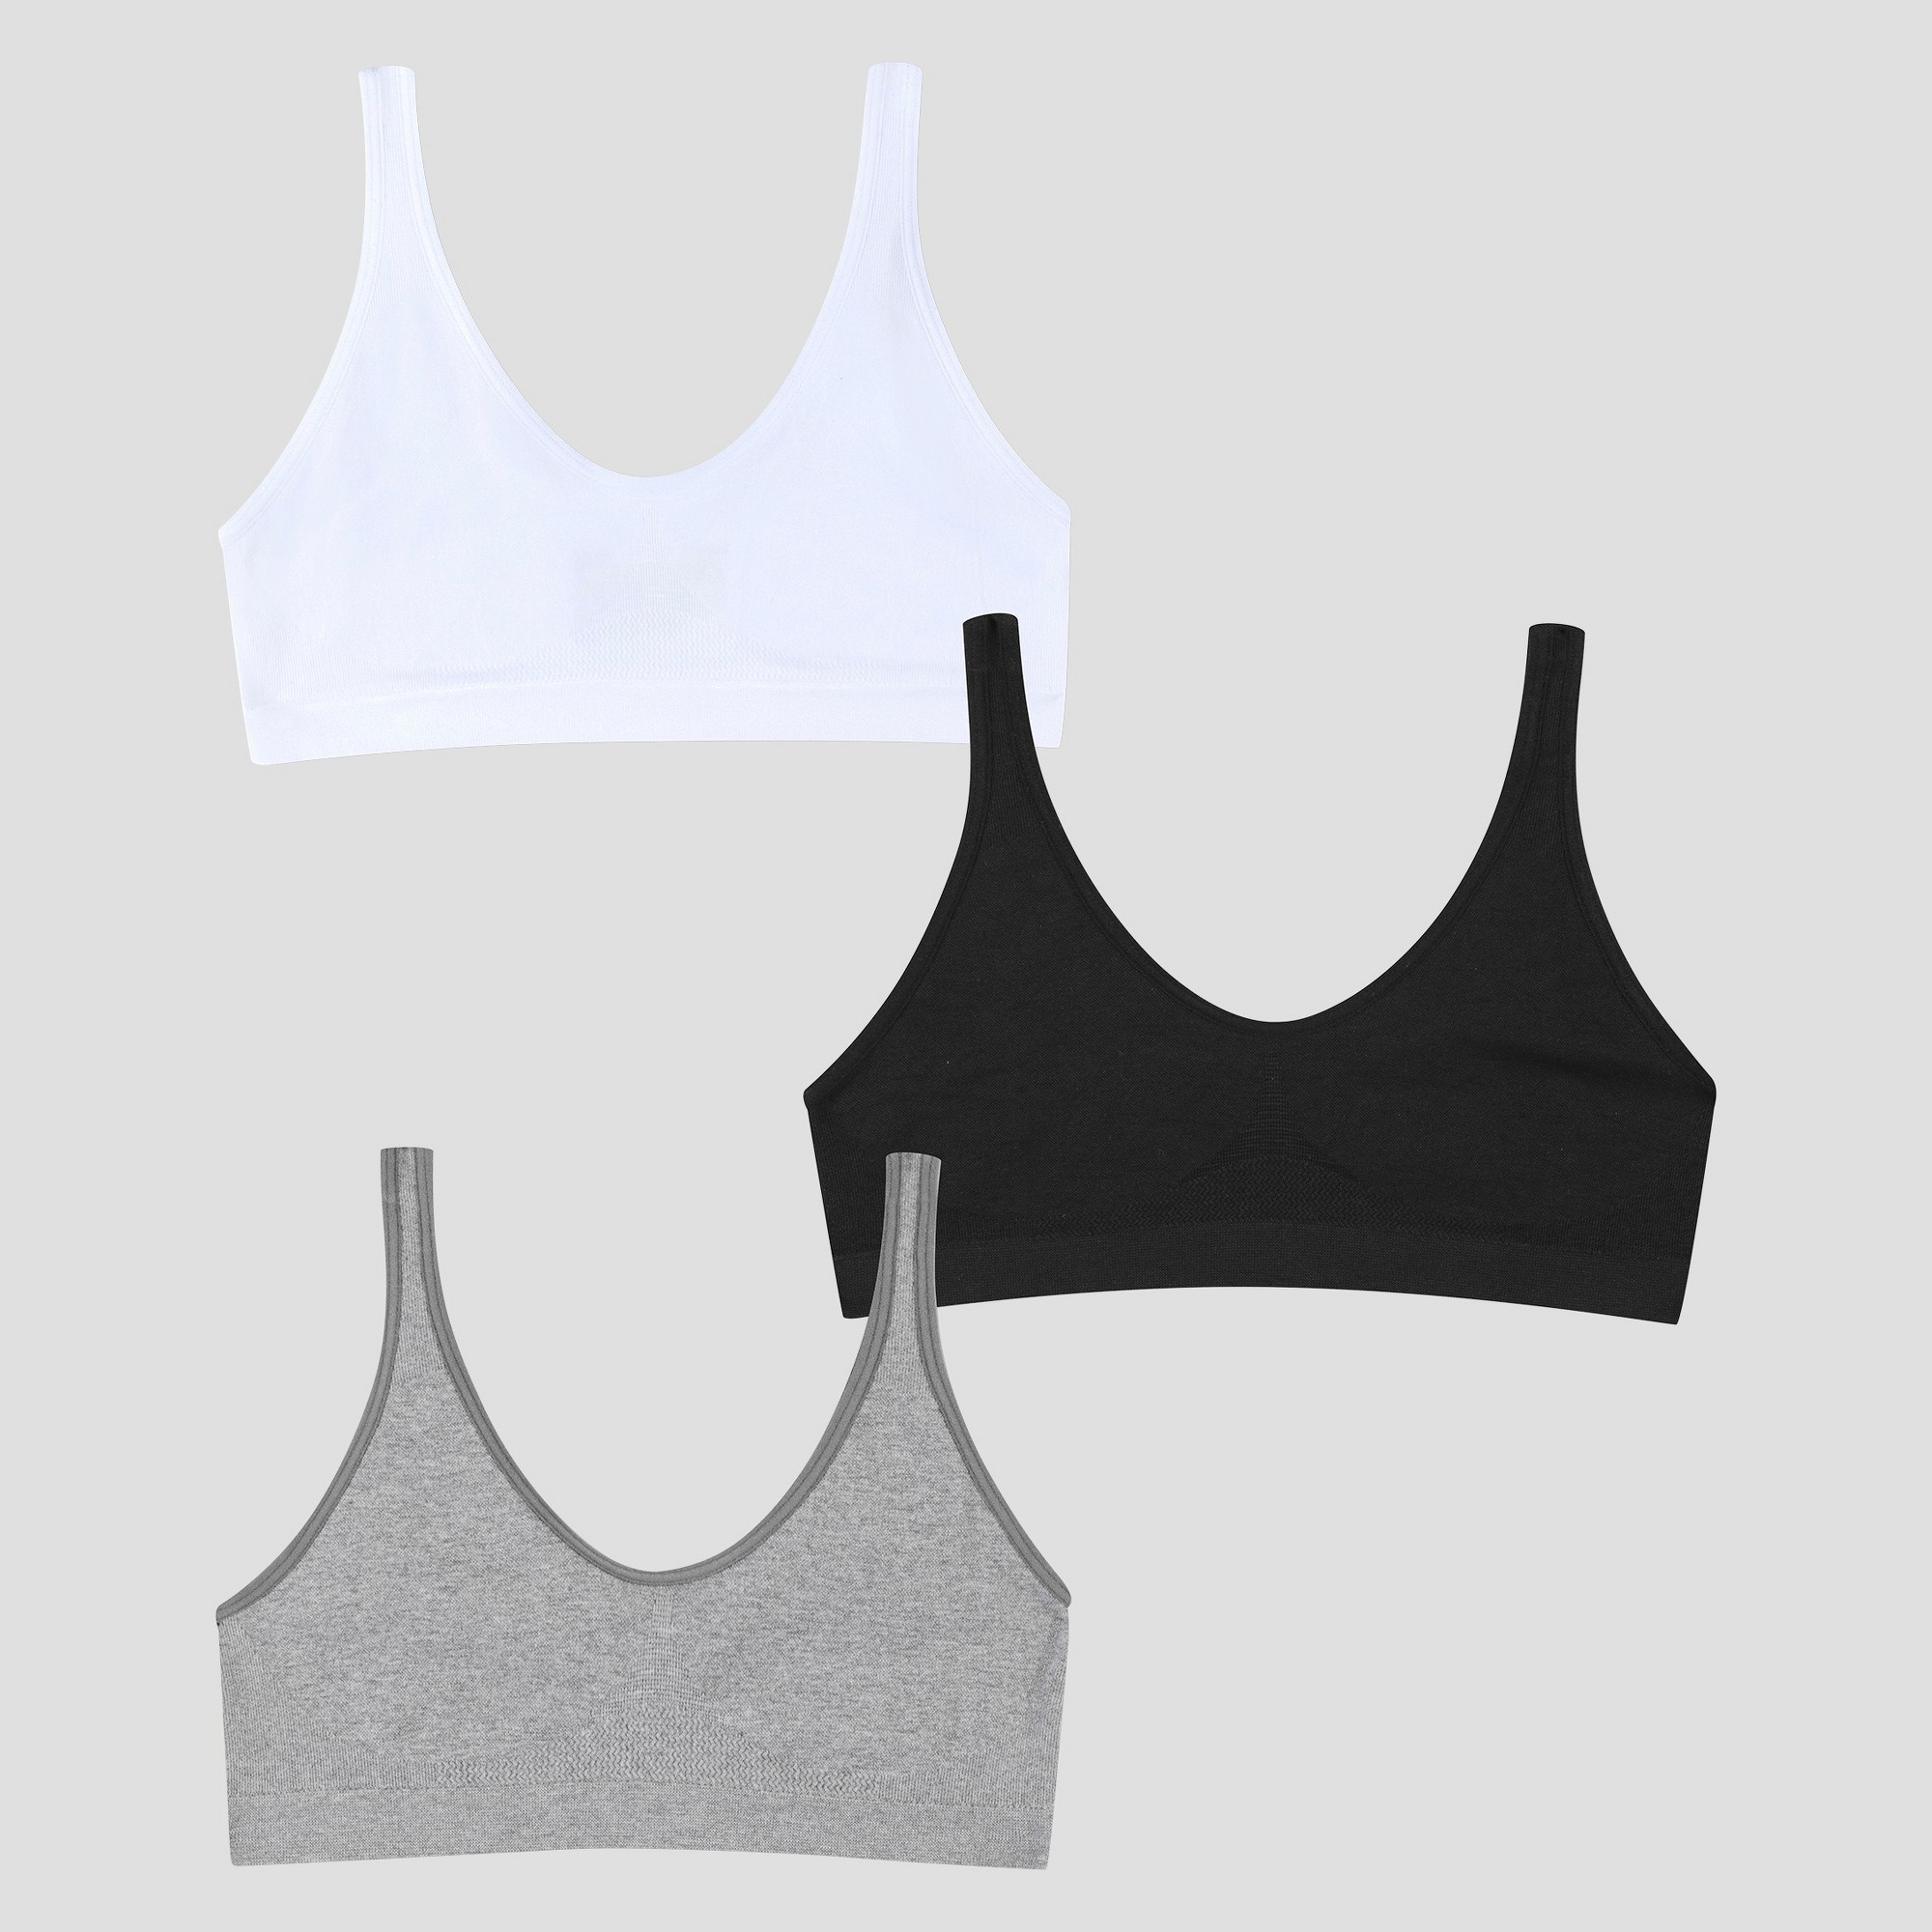 ef115d77c4787 Hanes Girls' 2+1 Bonus Pack Get Cozy Seamless Pullover Bra - White/Black/ Gray M